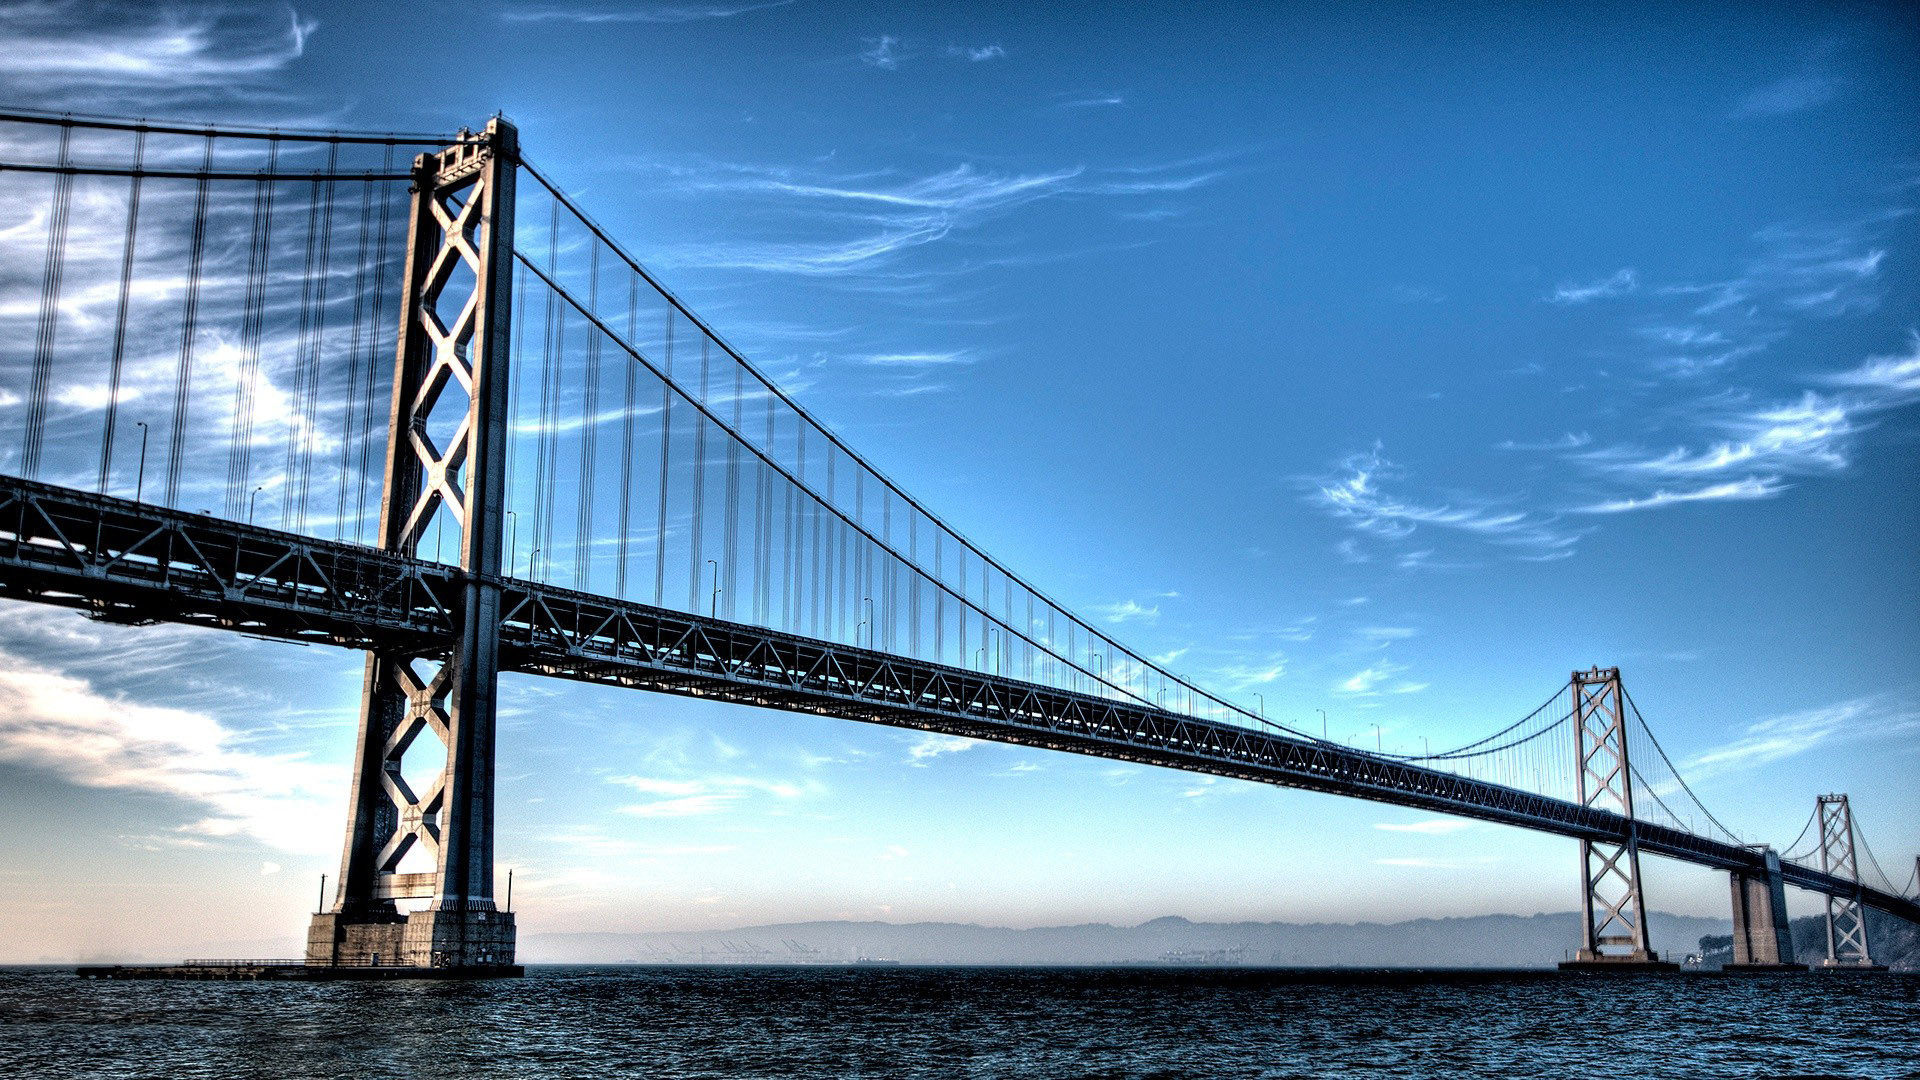 Mechanical engineering wallpapers hd 67 images - Bridge wallpaper hd ...